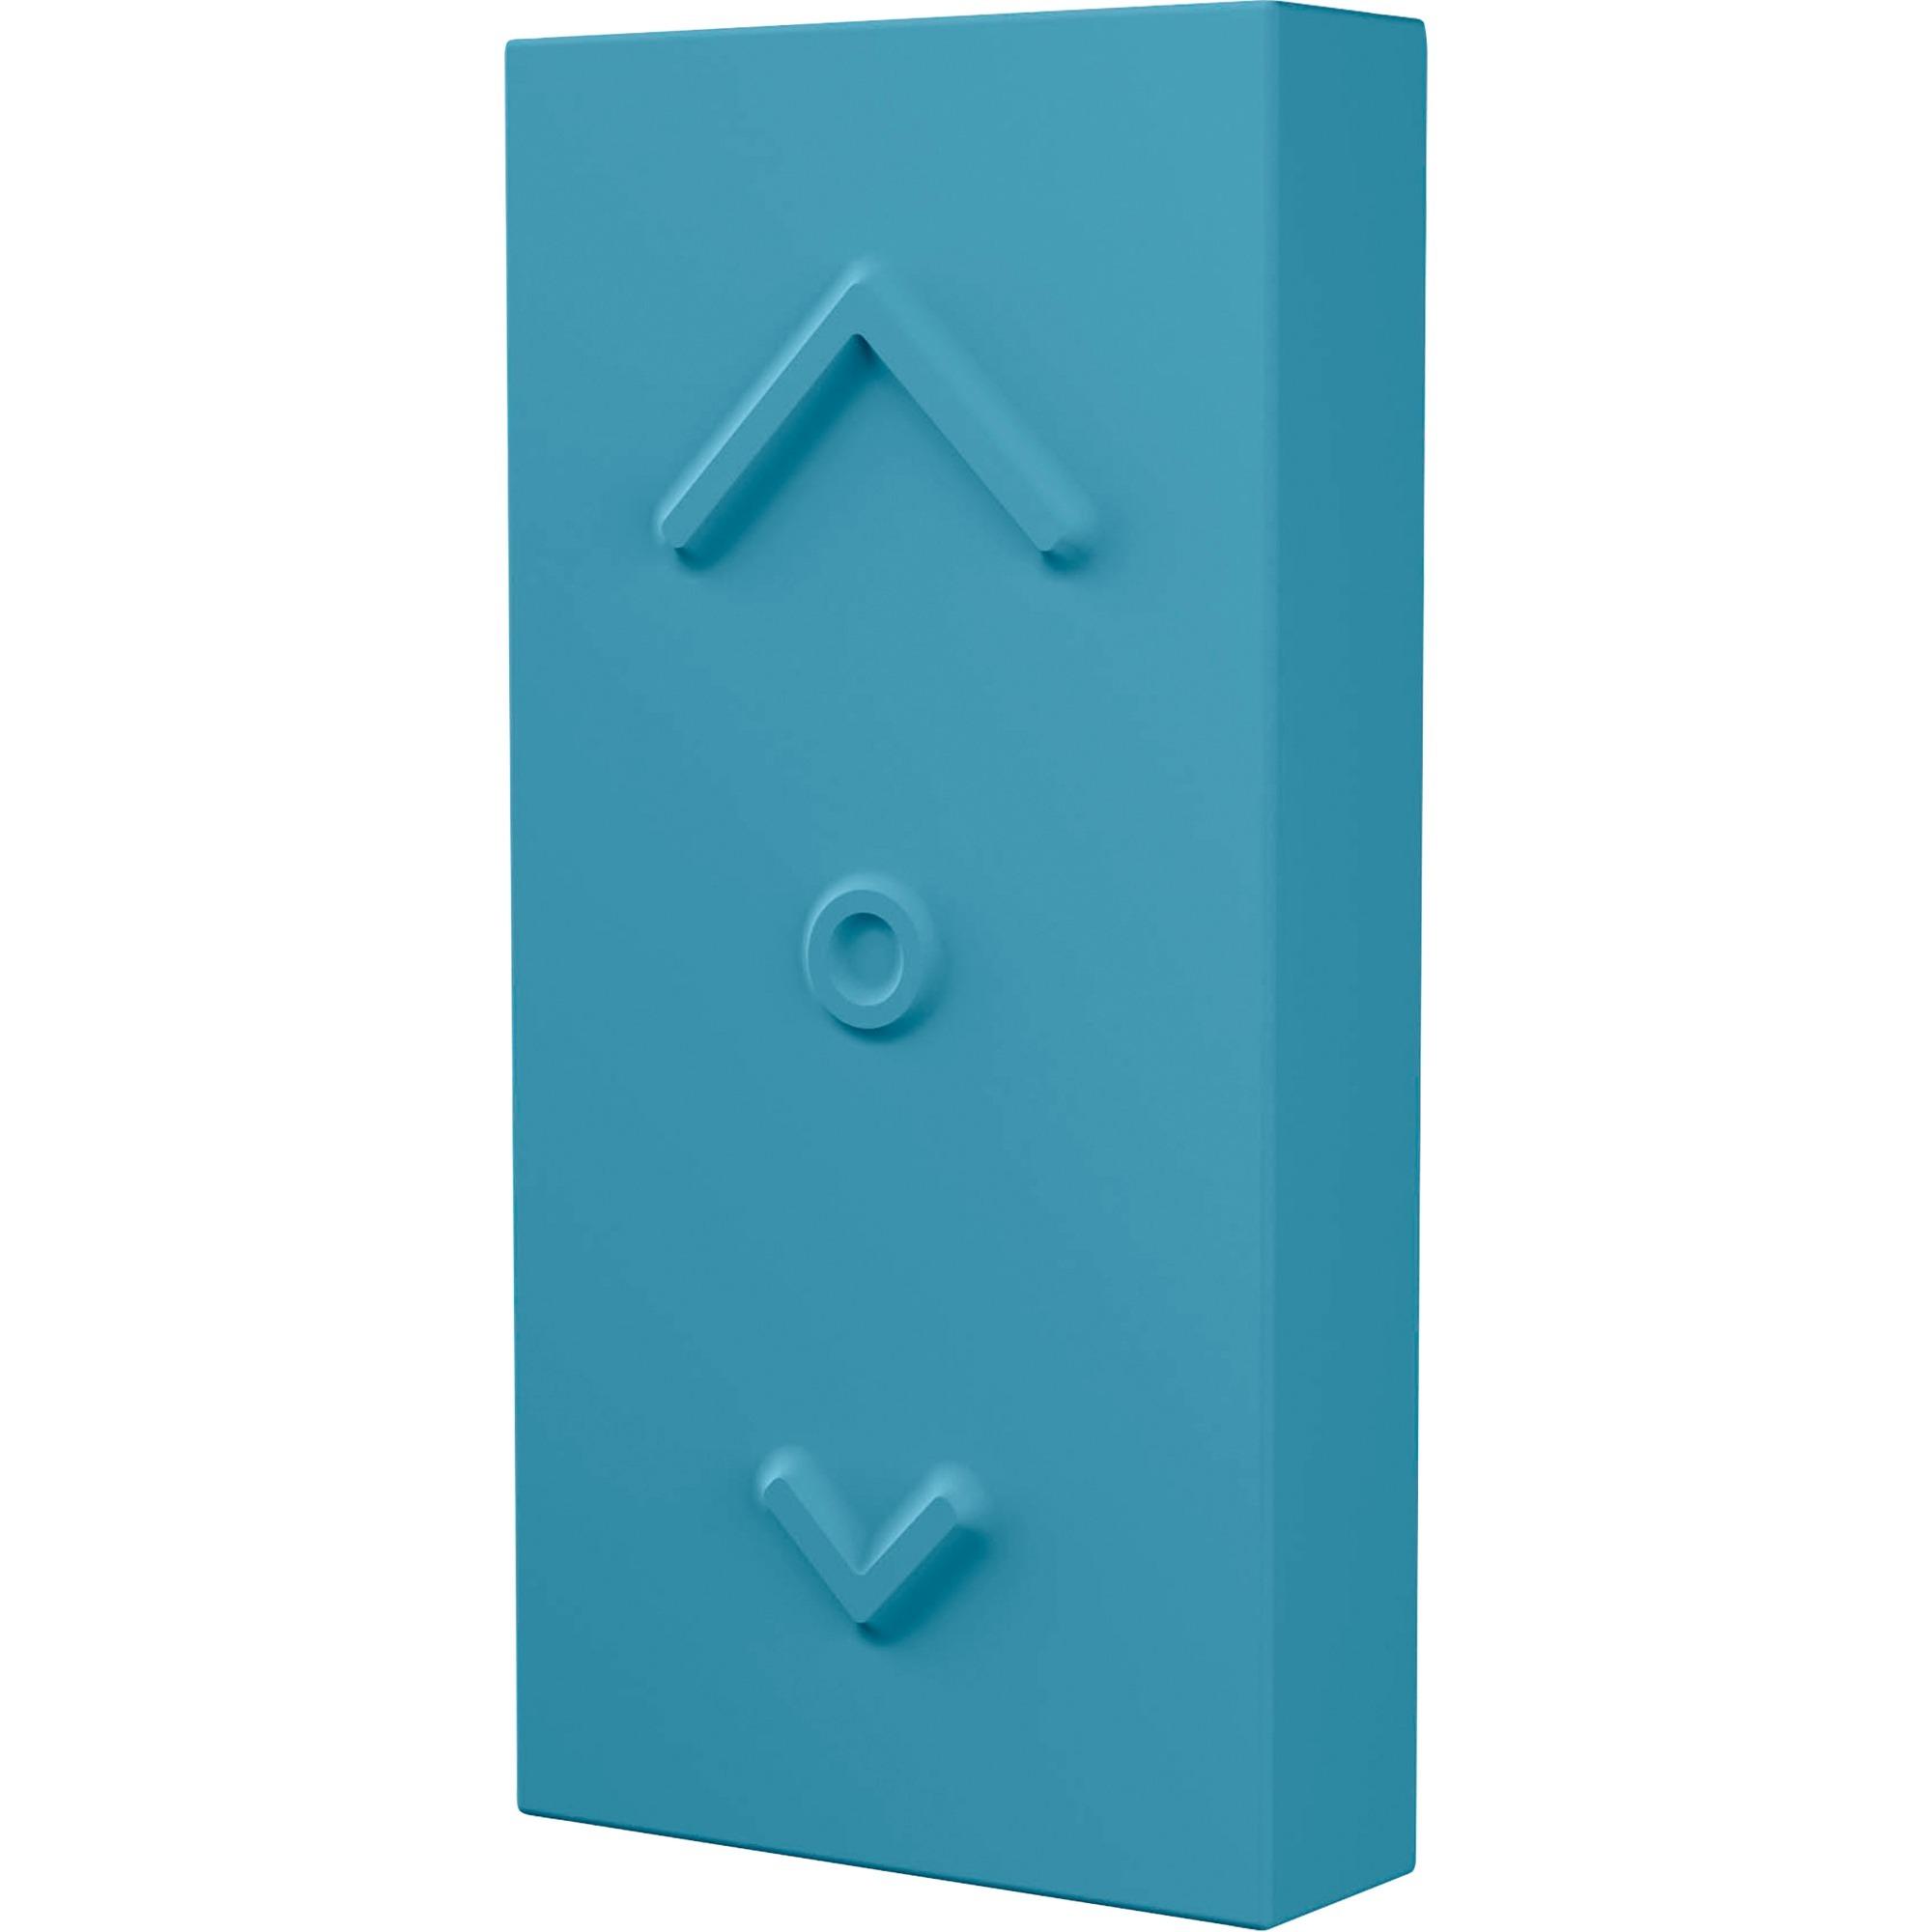 Smart interruptor de luz Azul, Mando a distancia